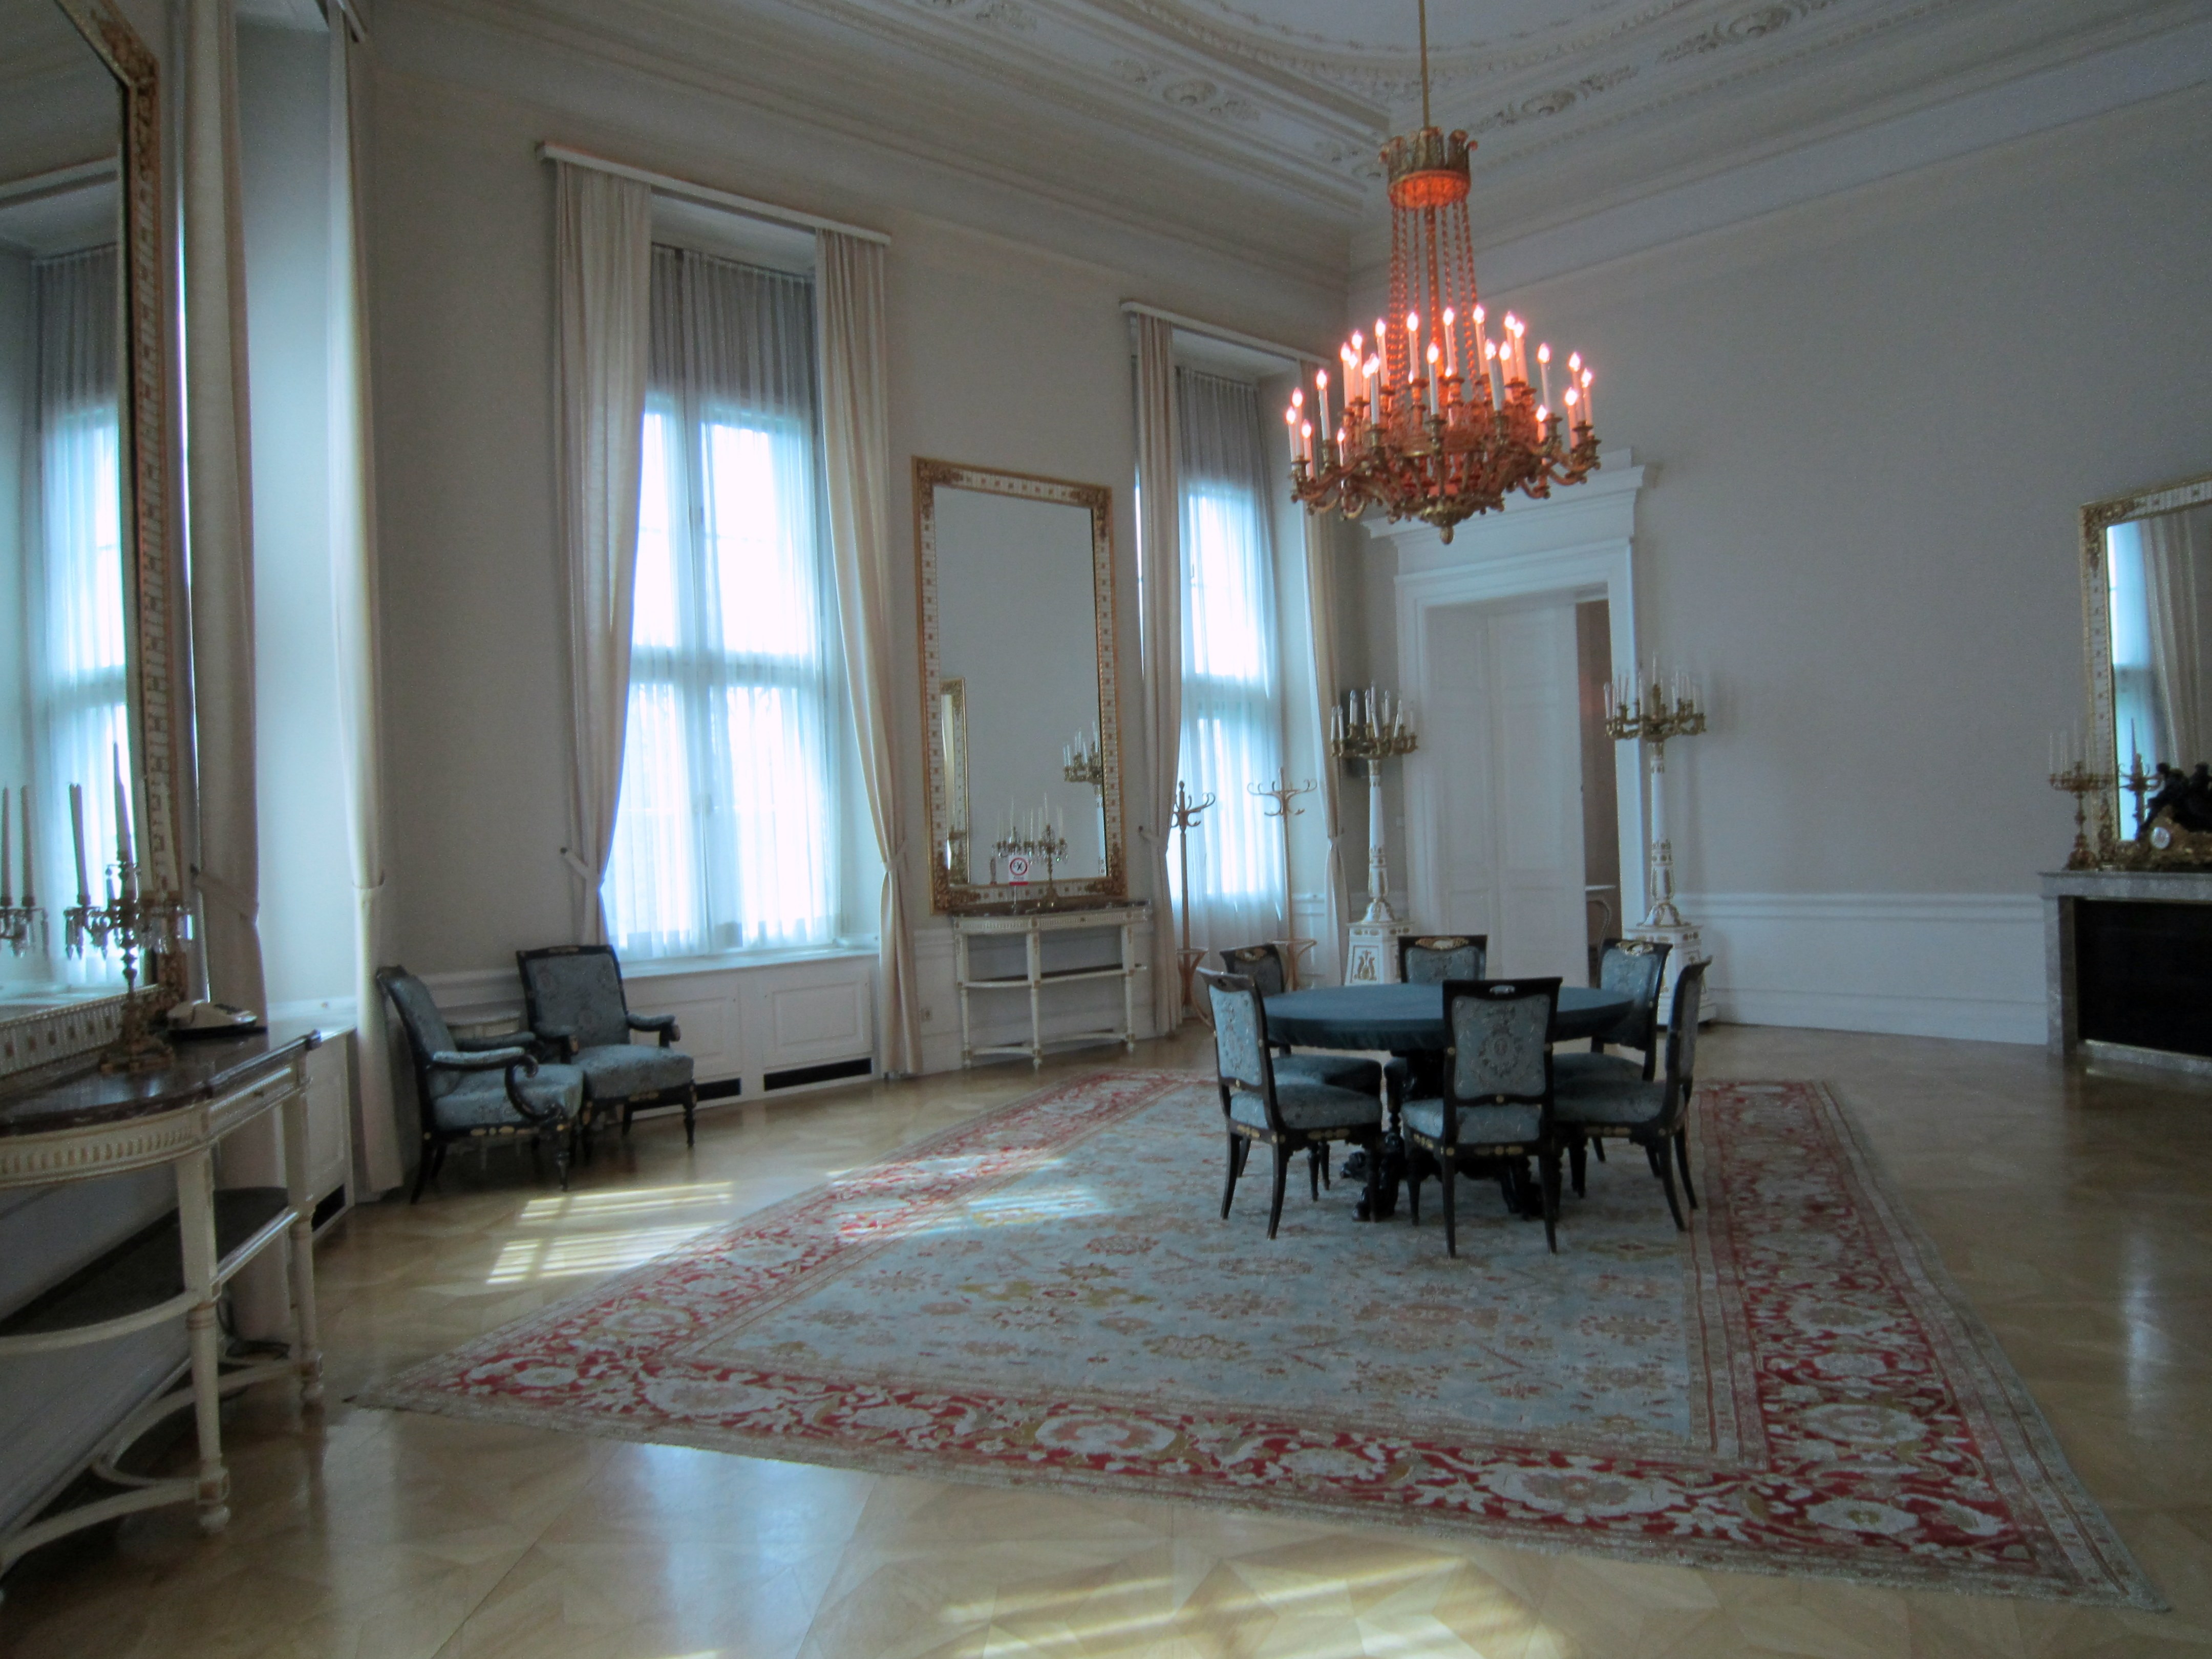 File:Bundeskanzleramt - Zimmer.JPG - Wikimedia Commons